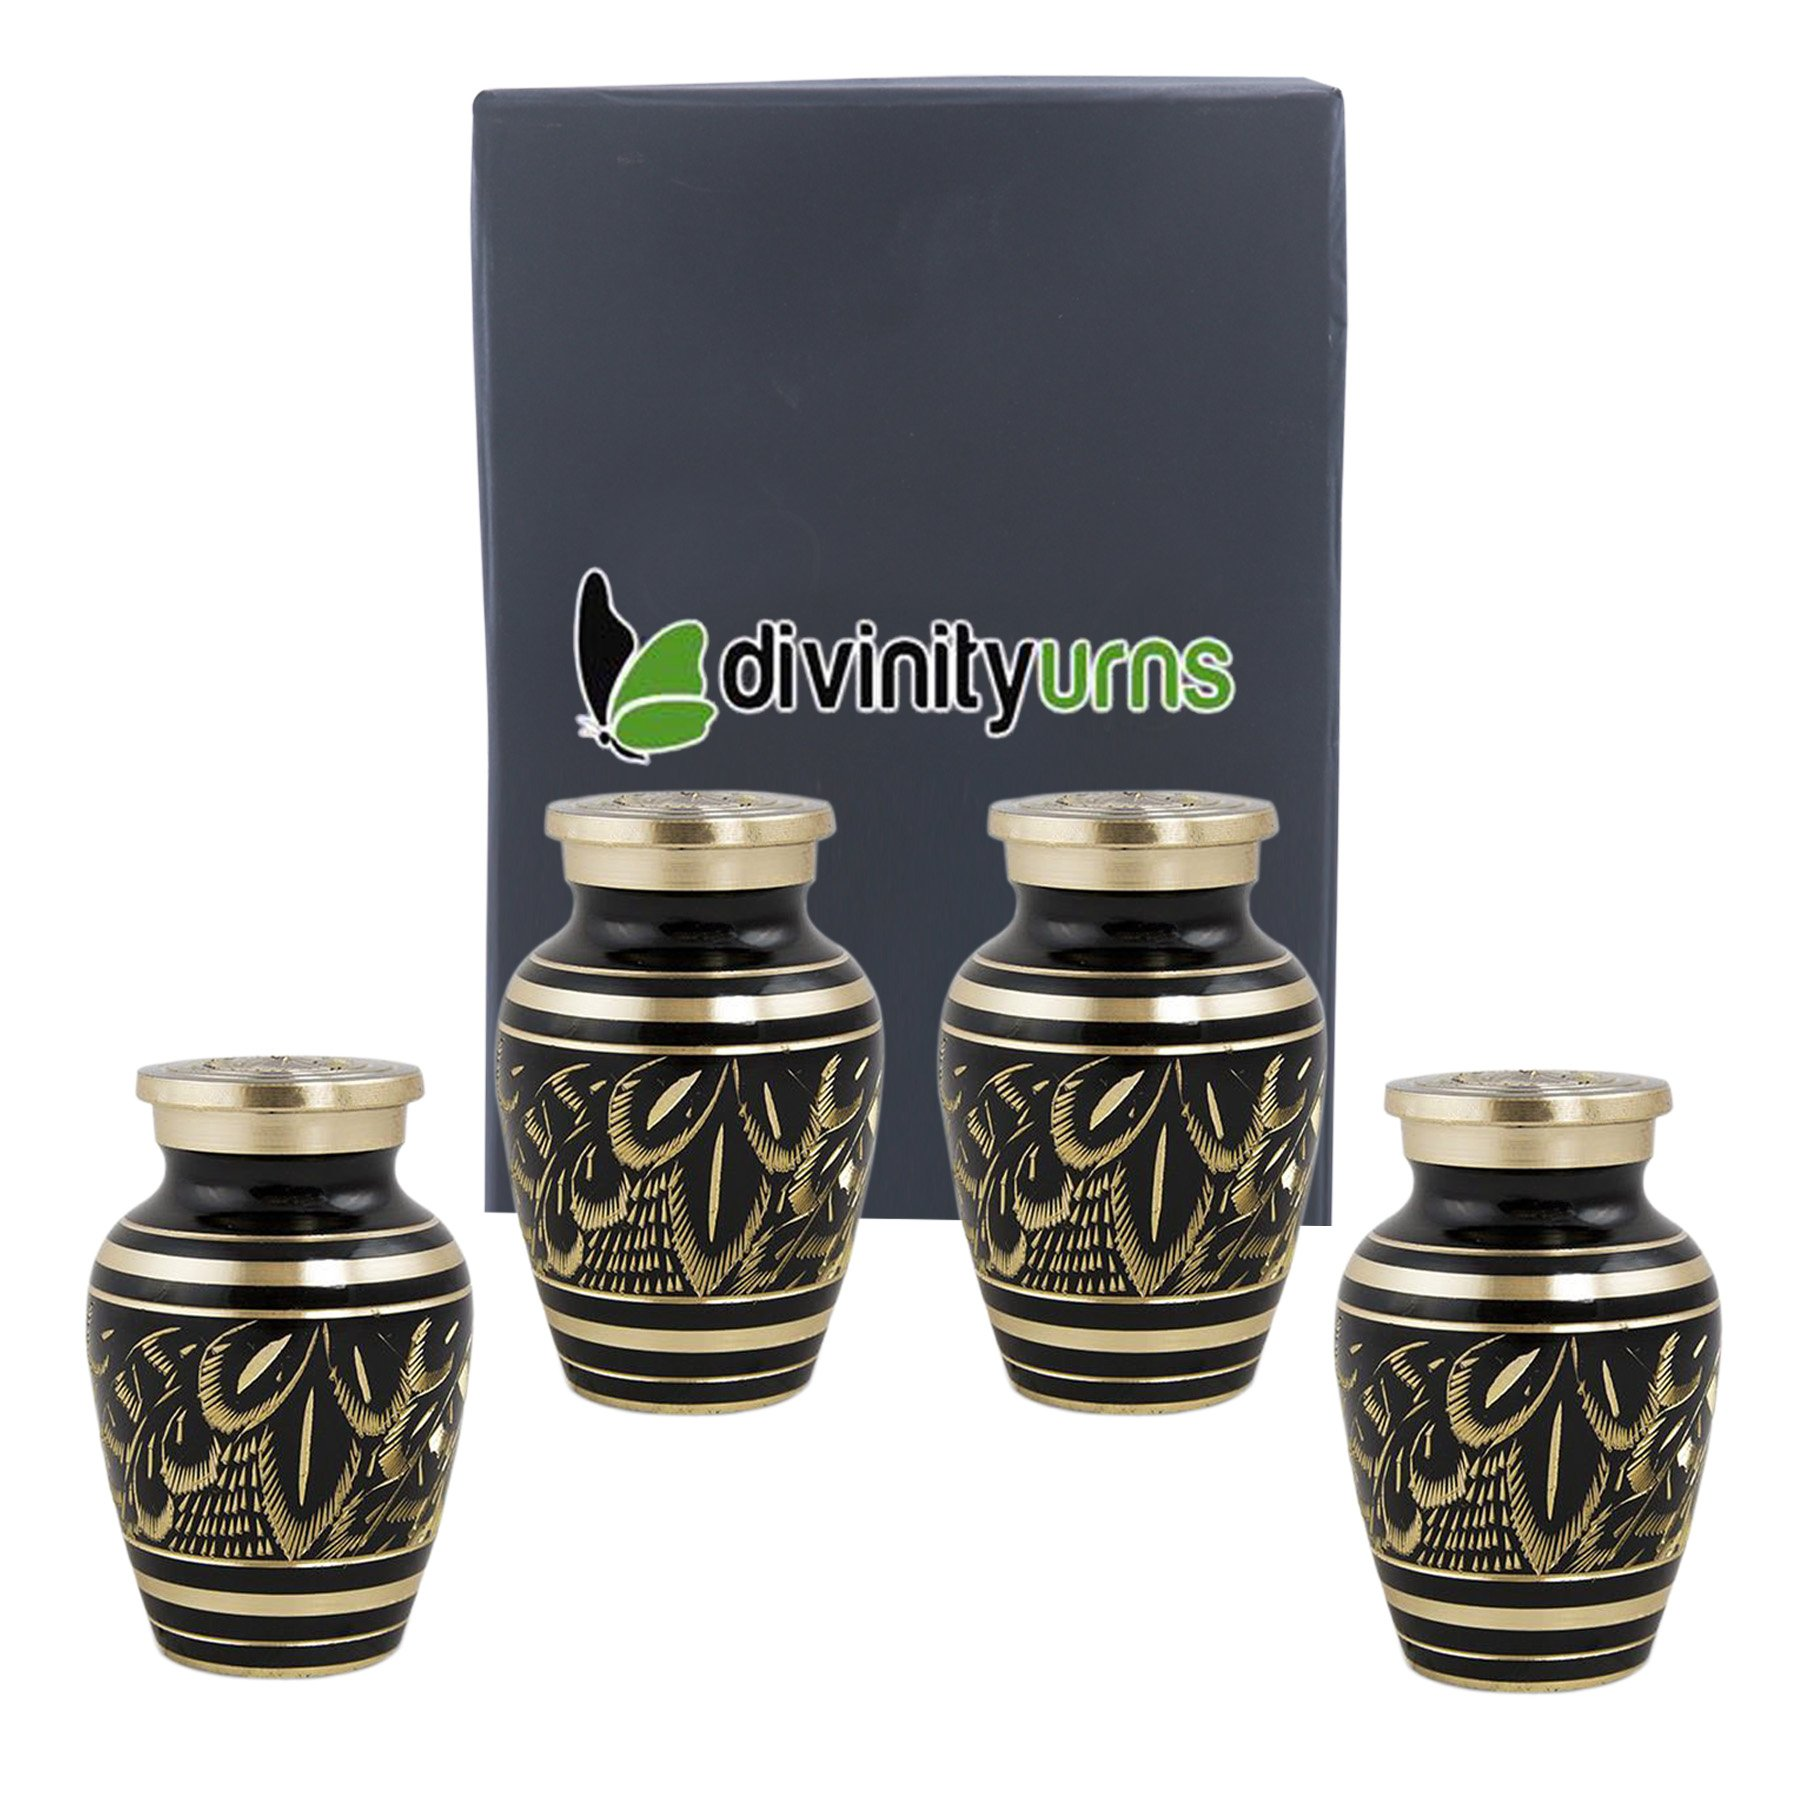 Classic Radiance Brass Keepsakes Set of 4 - Elite Black & Gold Keepsake Urns - Engraved Majestic Radiance Token Urns - Handcrafted and Affordable Mini Urns for Ashes